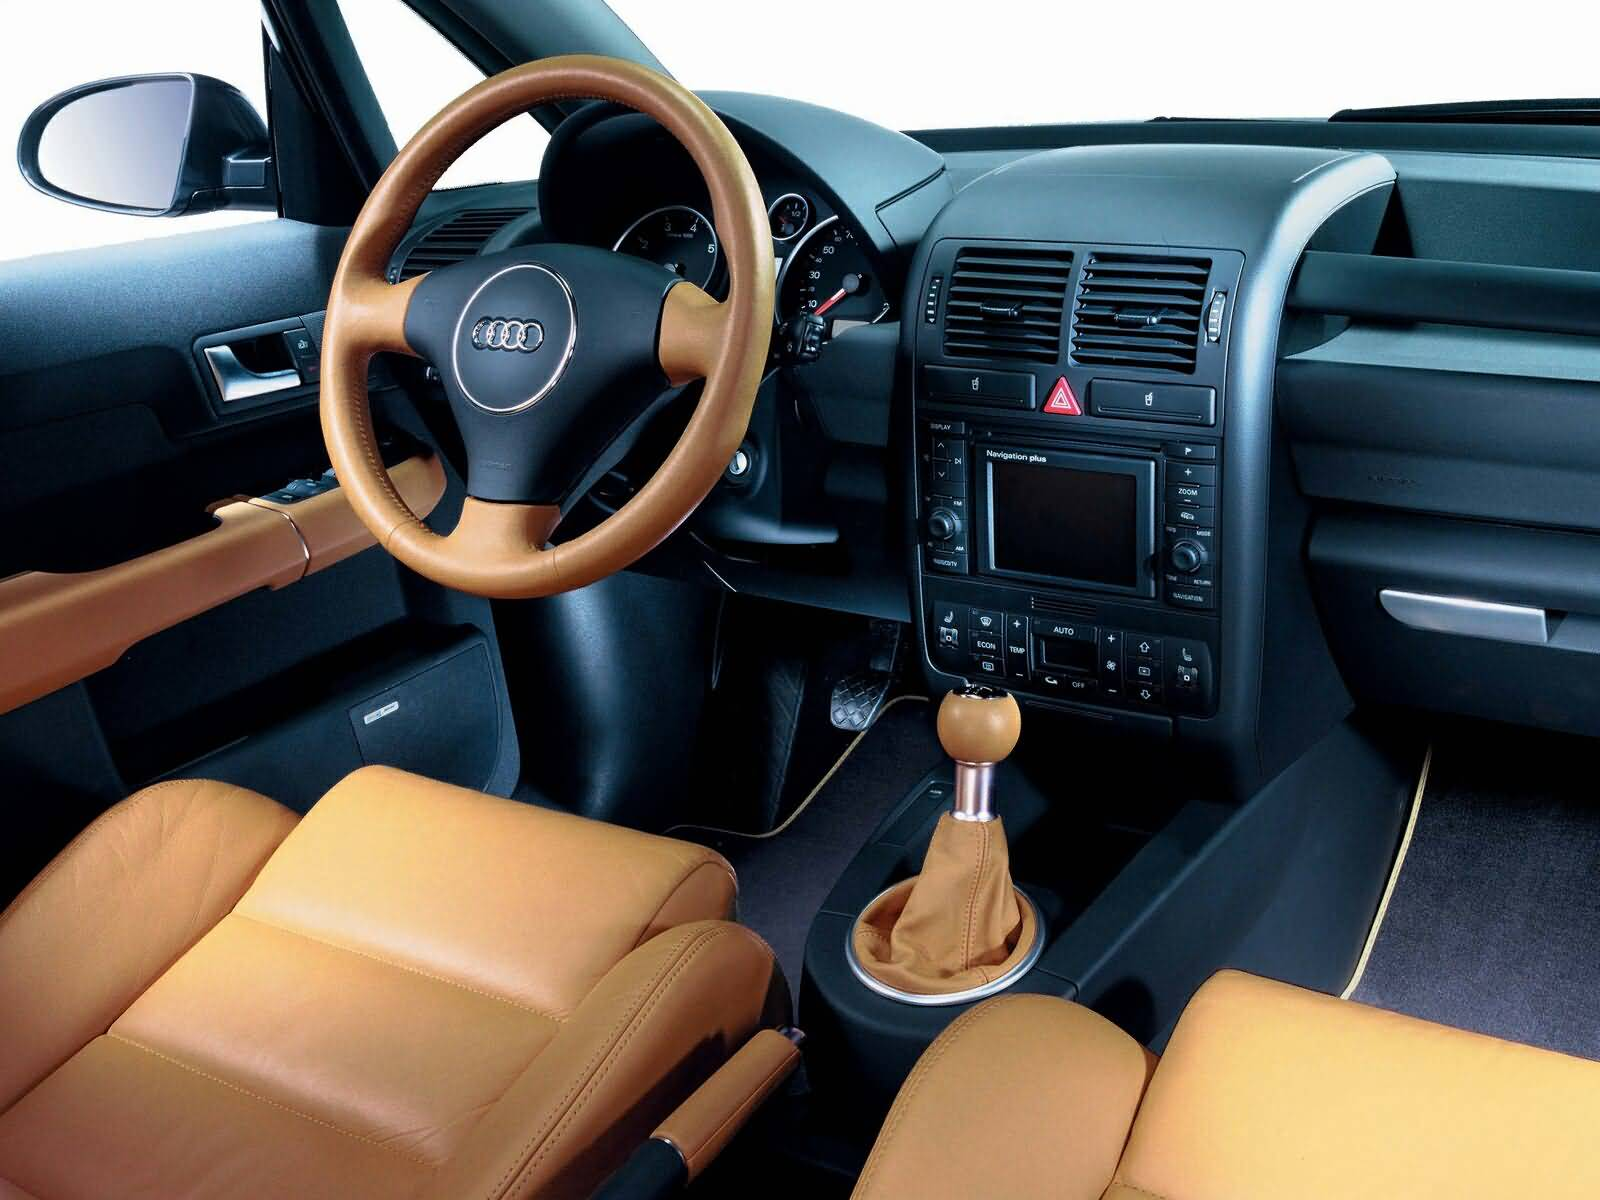 Beautiful inside view of Audi A2 Car